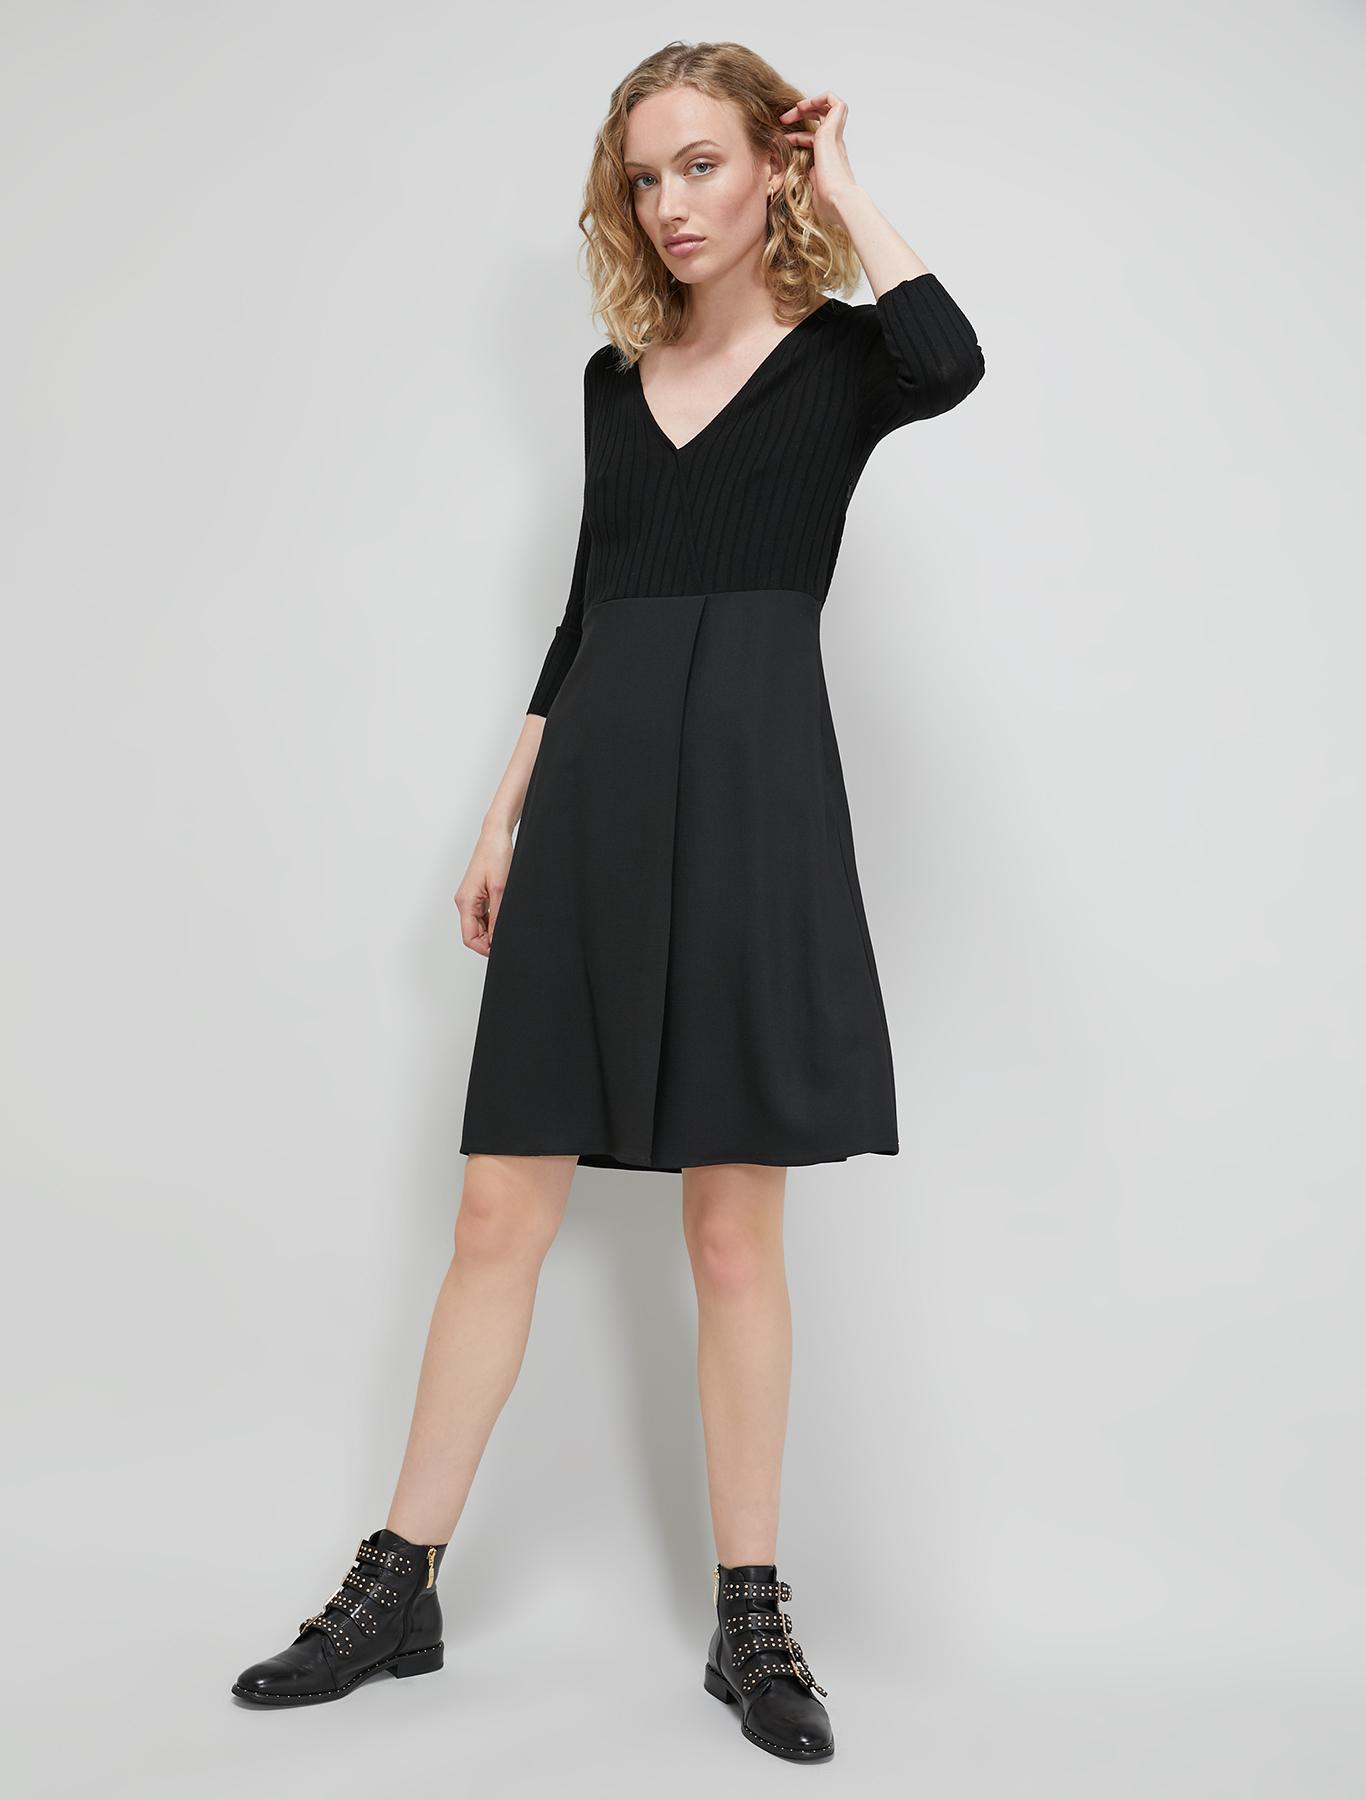 Flowing fabric knit dress - black - pennyblack